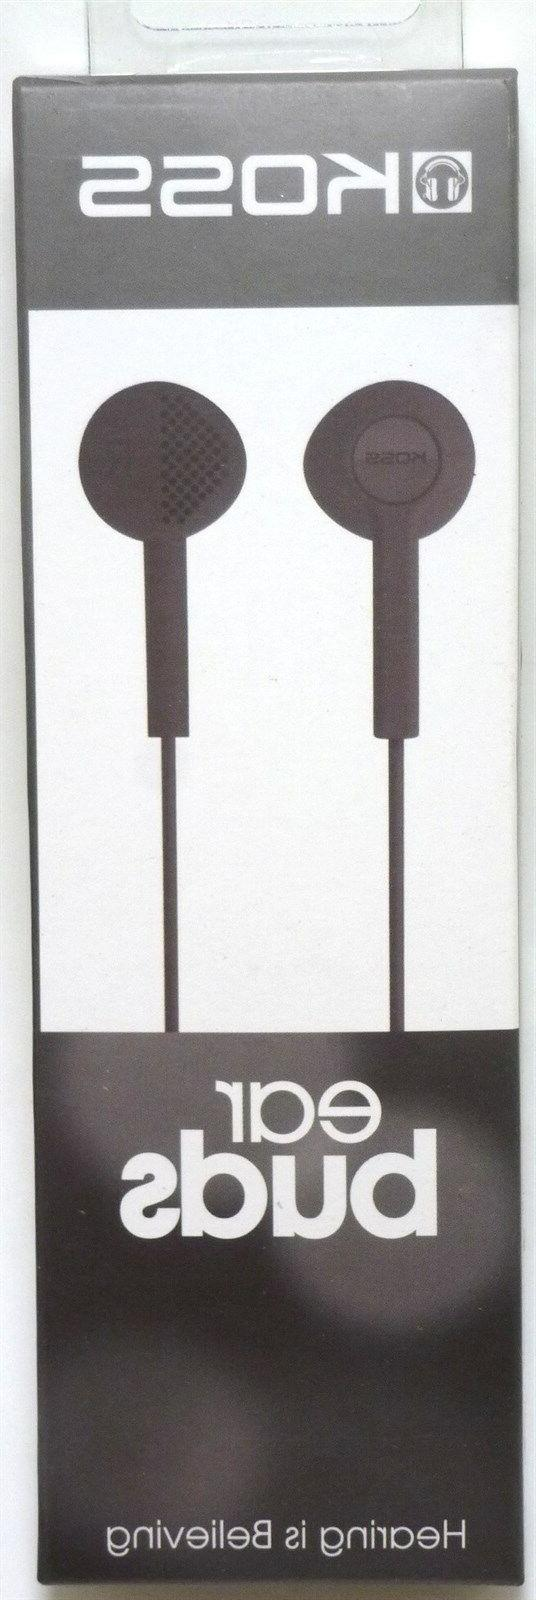 KE5K Earphone - Stereo - Black - Wired - 32 Ohm - 70 Hz 20 k